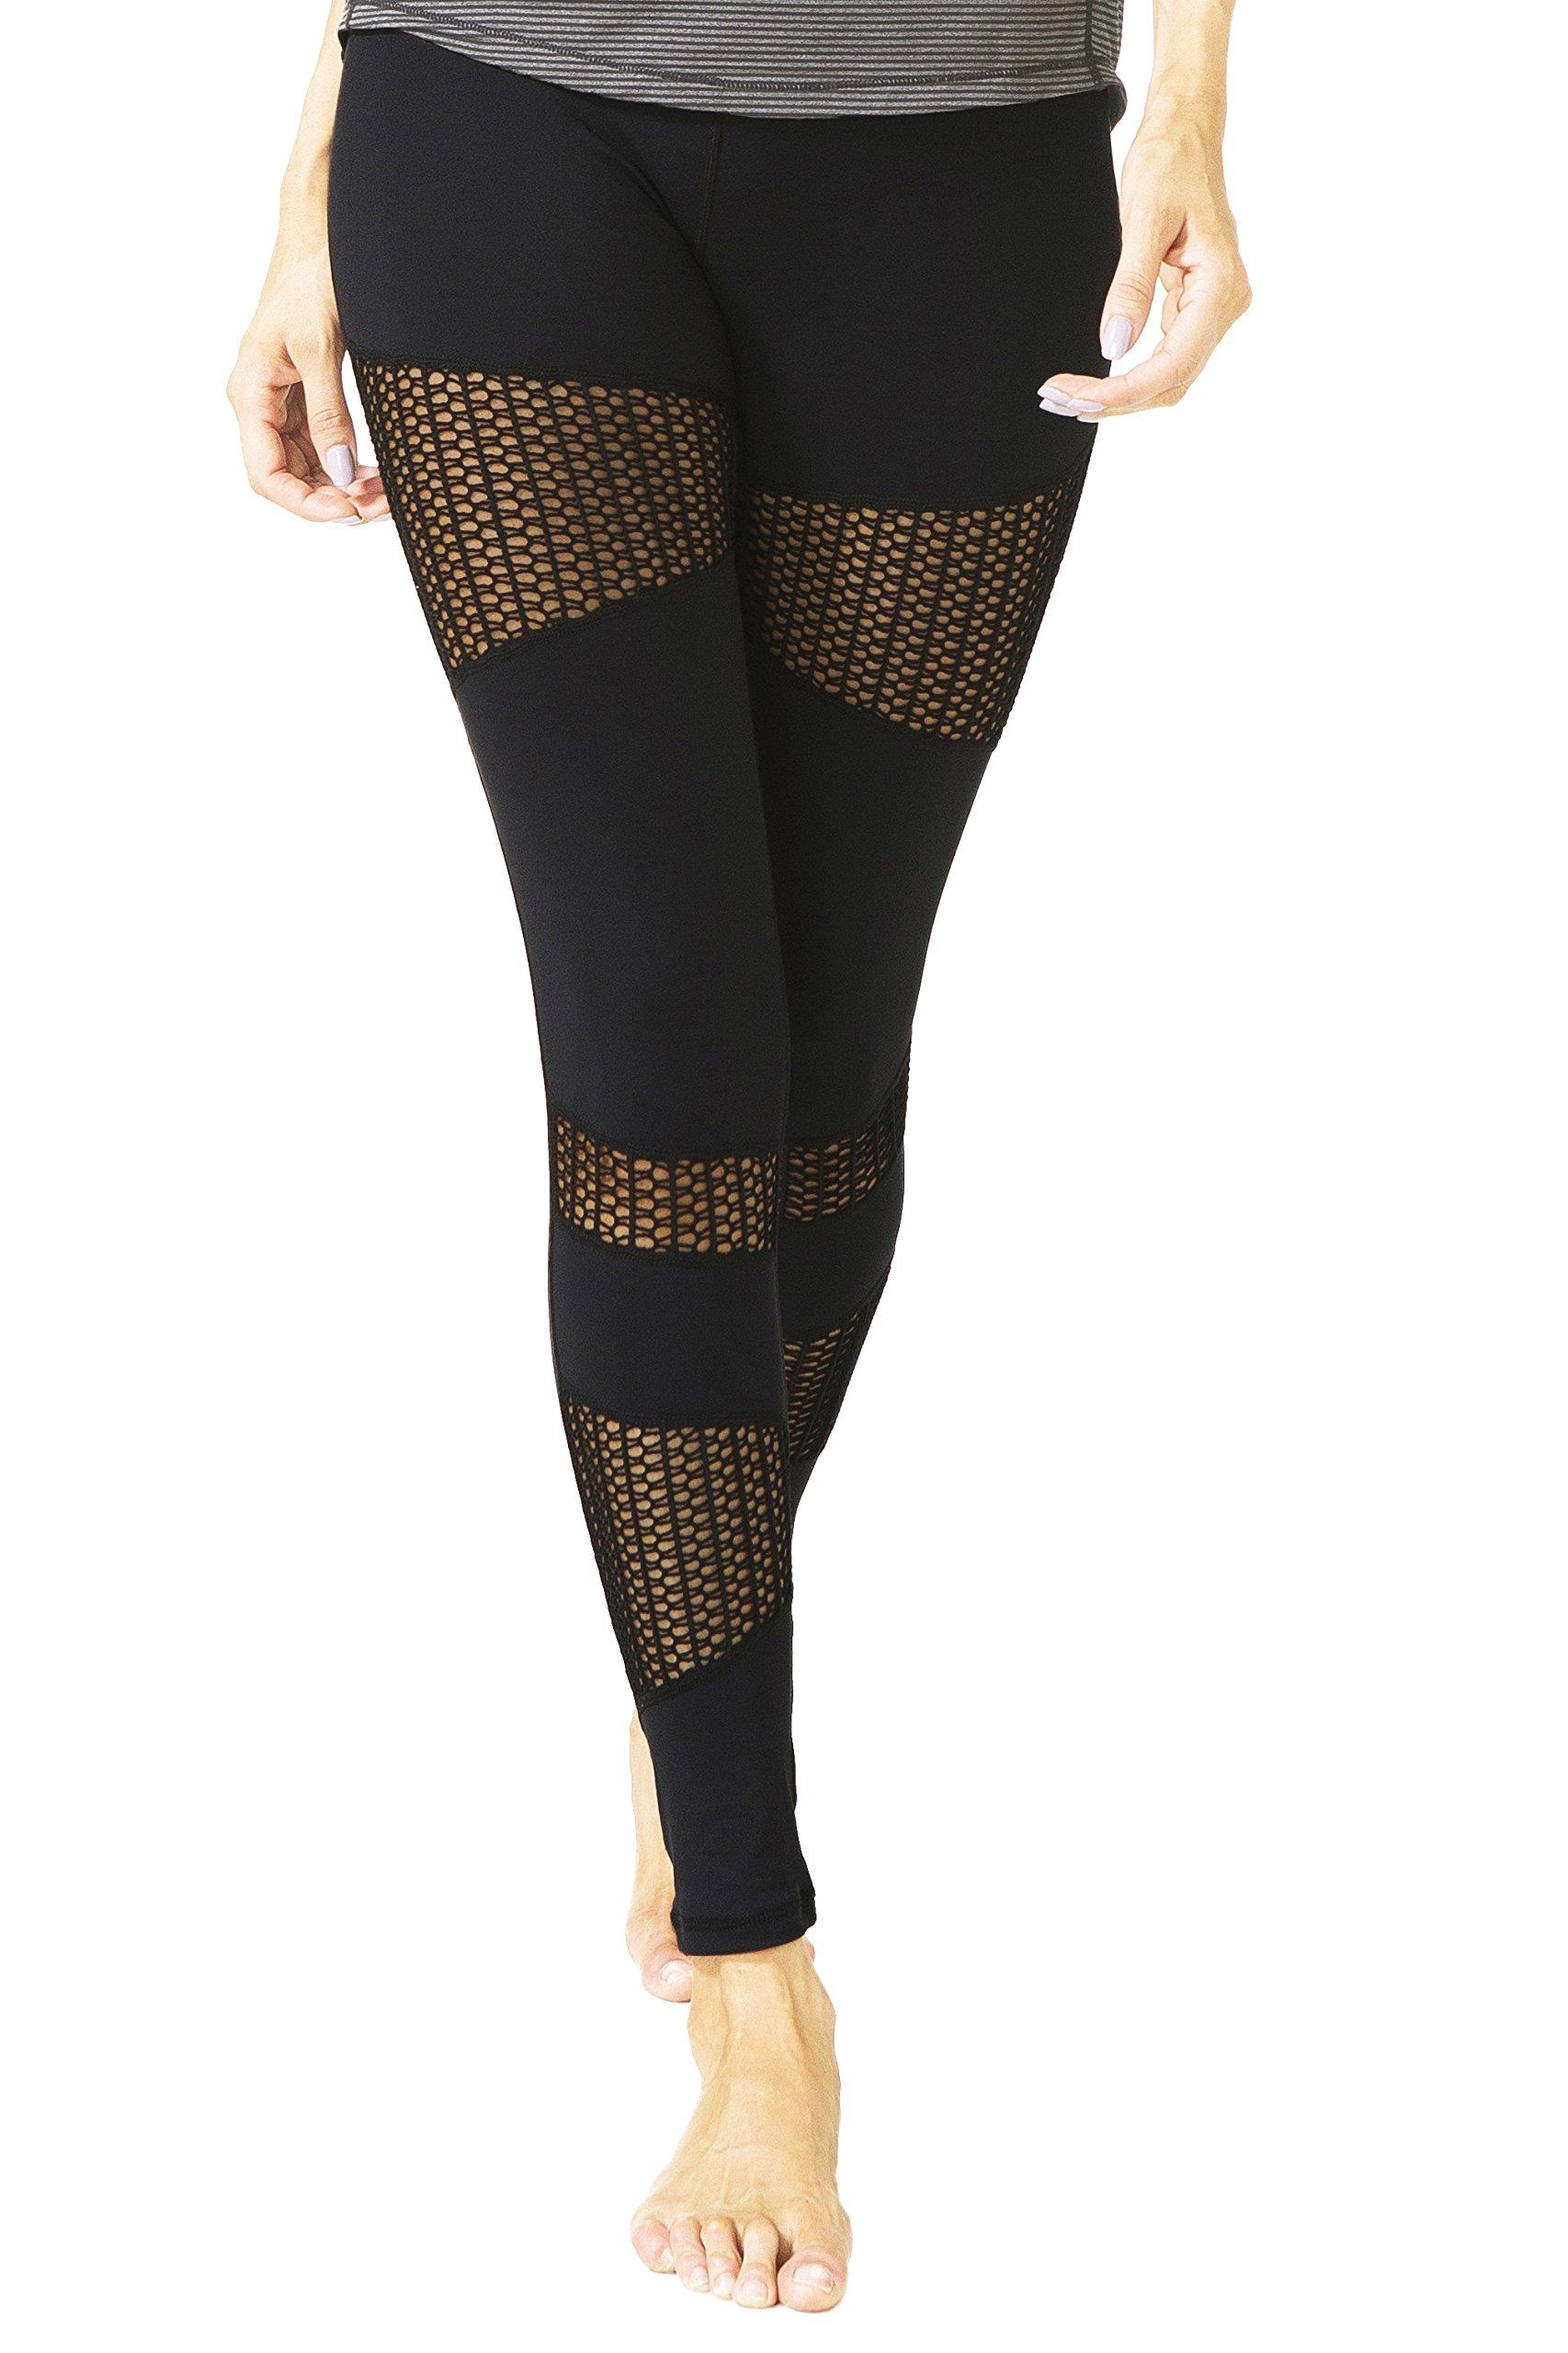 Queenie Ke Women Power Tech Mesh High Waist Pocket Gym Yoga Leggings Running Pants Workout Tights Size M Color Black Big Mesh